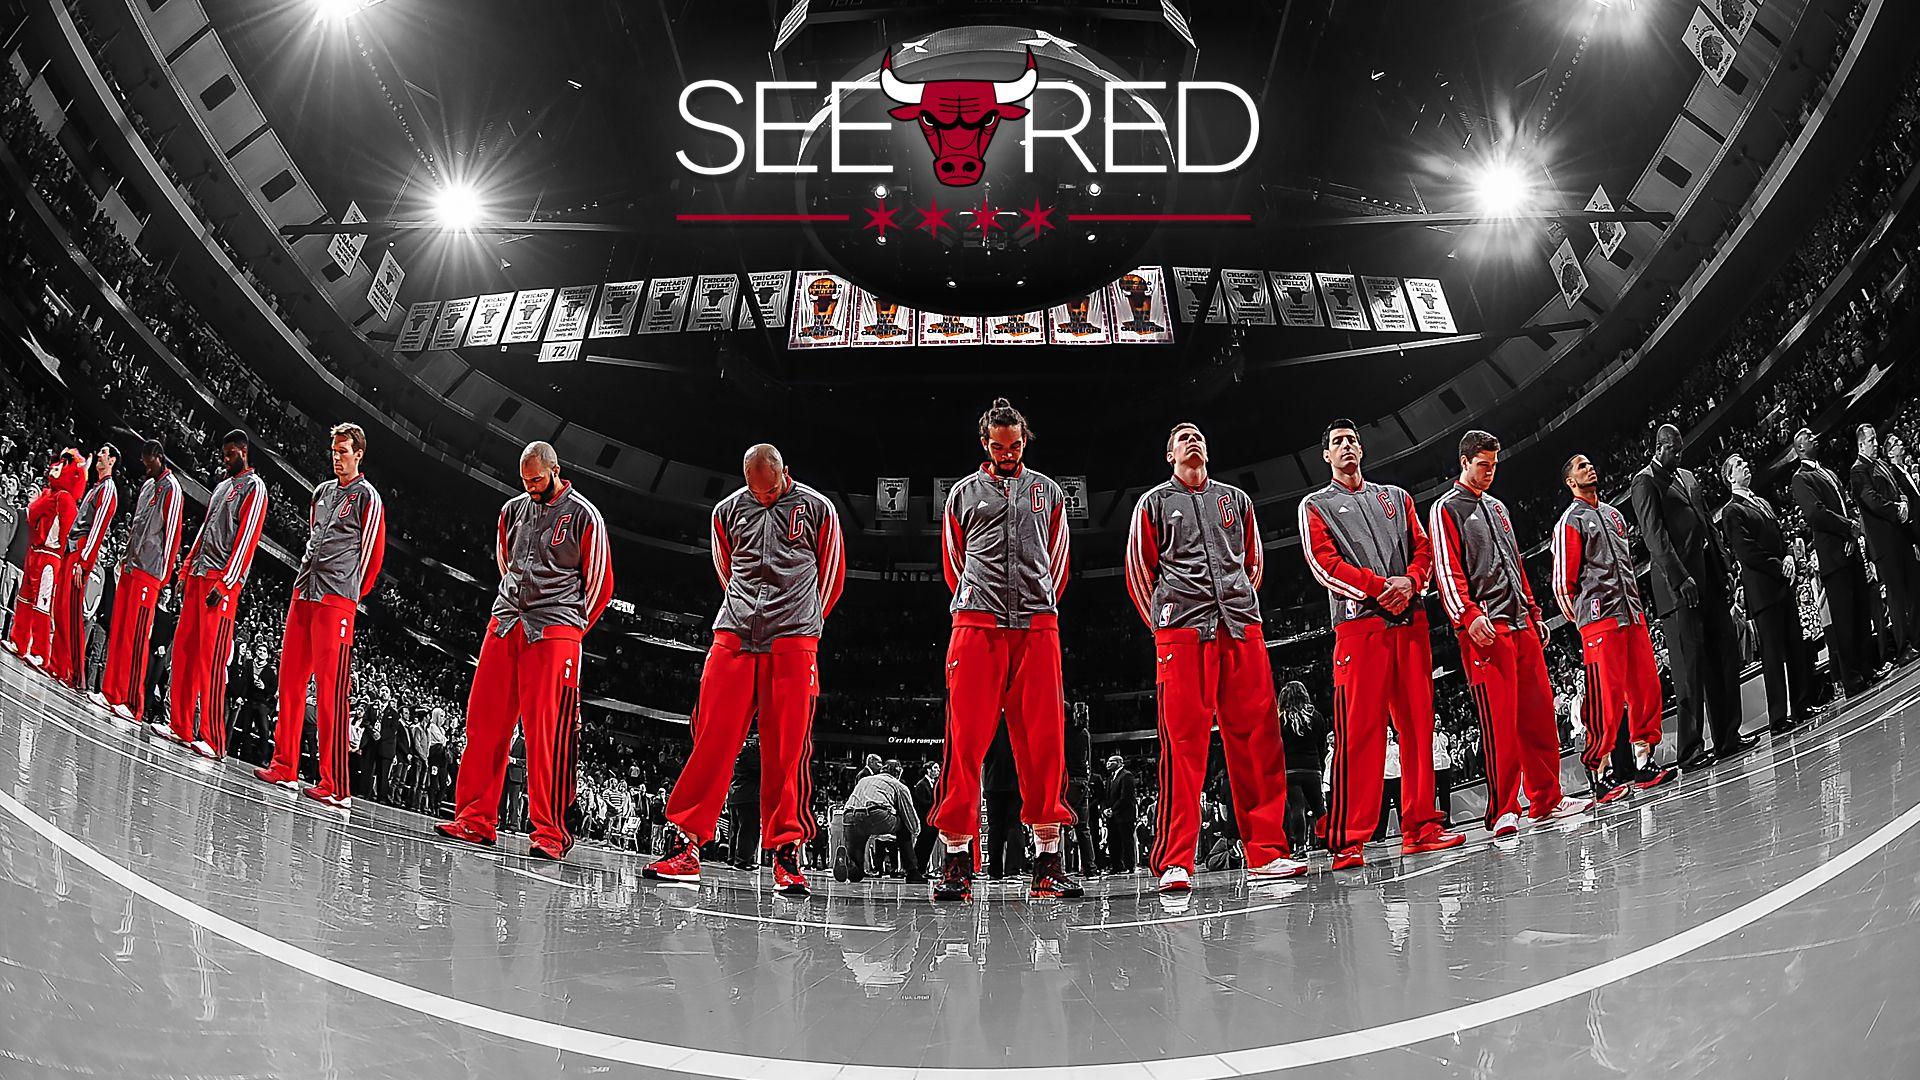 Pin By Chicago Bulls On Chicago Bulls Wallpapers Chicago Bulls Wallpaper Bulls Wallpaper Chicago Bulls